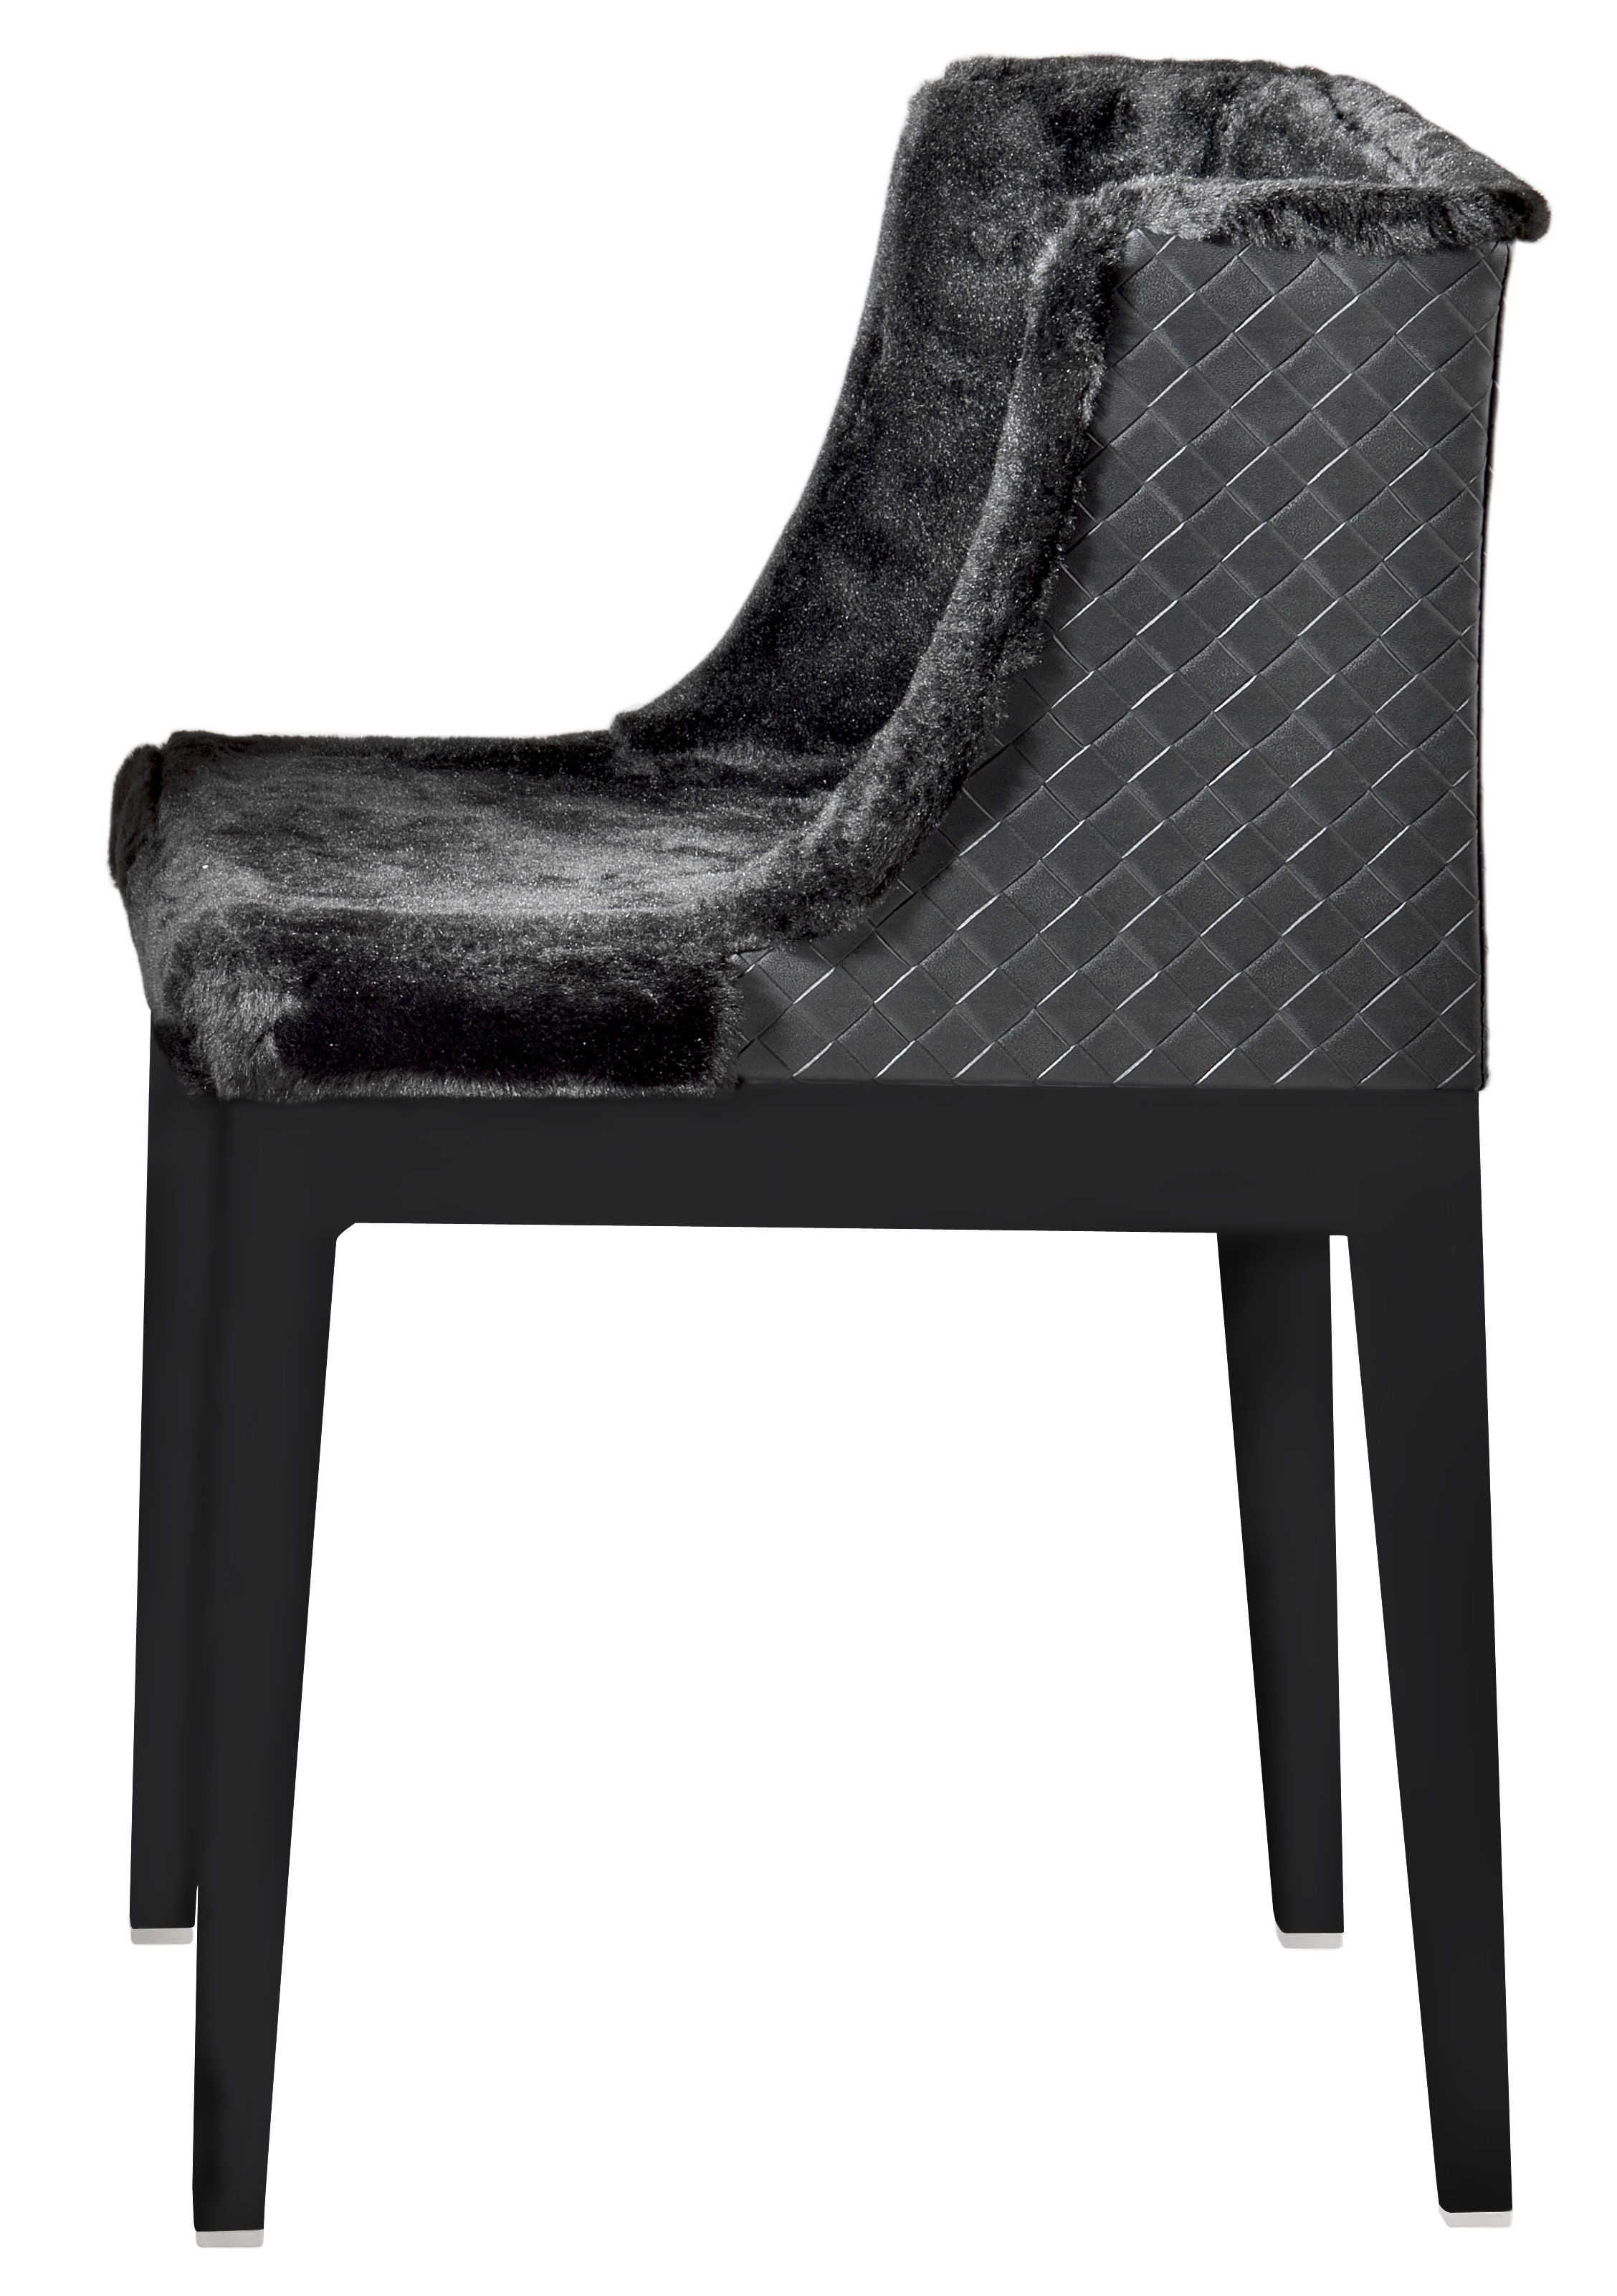 Möbel - Stühle  - Mademoiselle Kravitz Gepolsterter Sessel Sessel - Kartell - Korpus schwarz / Sitzfläche mit Pelzbezug / Rückseite Leder im Flecht-Look - Fourrure synthétique, Leder, Polykarbonat